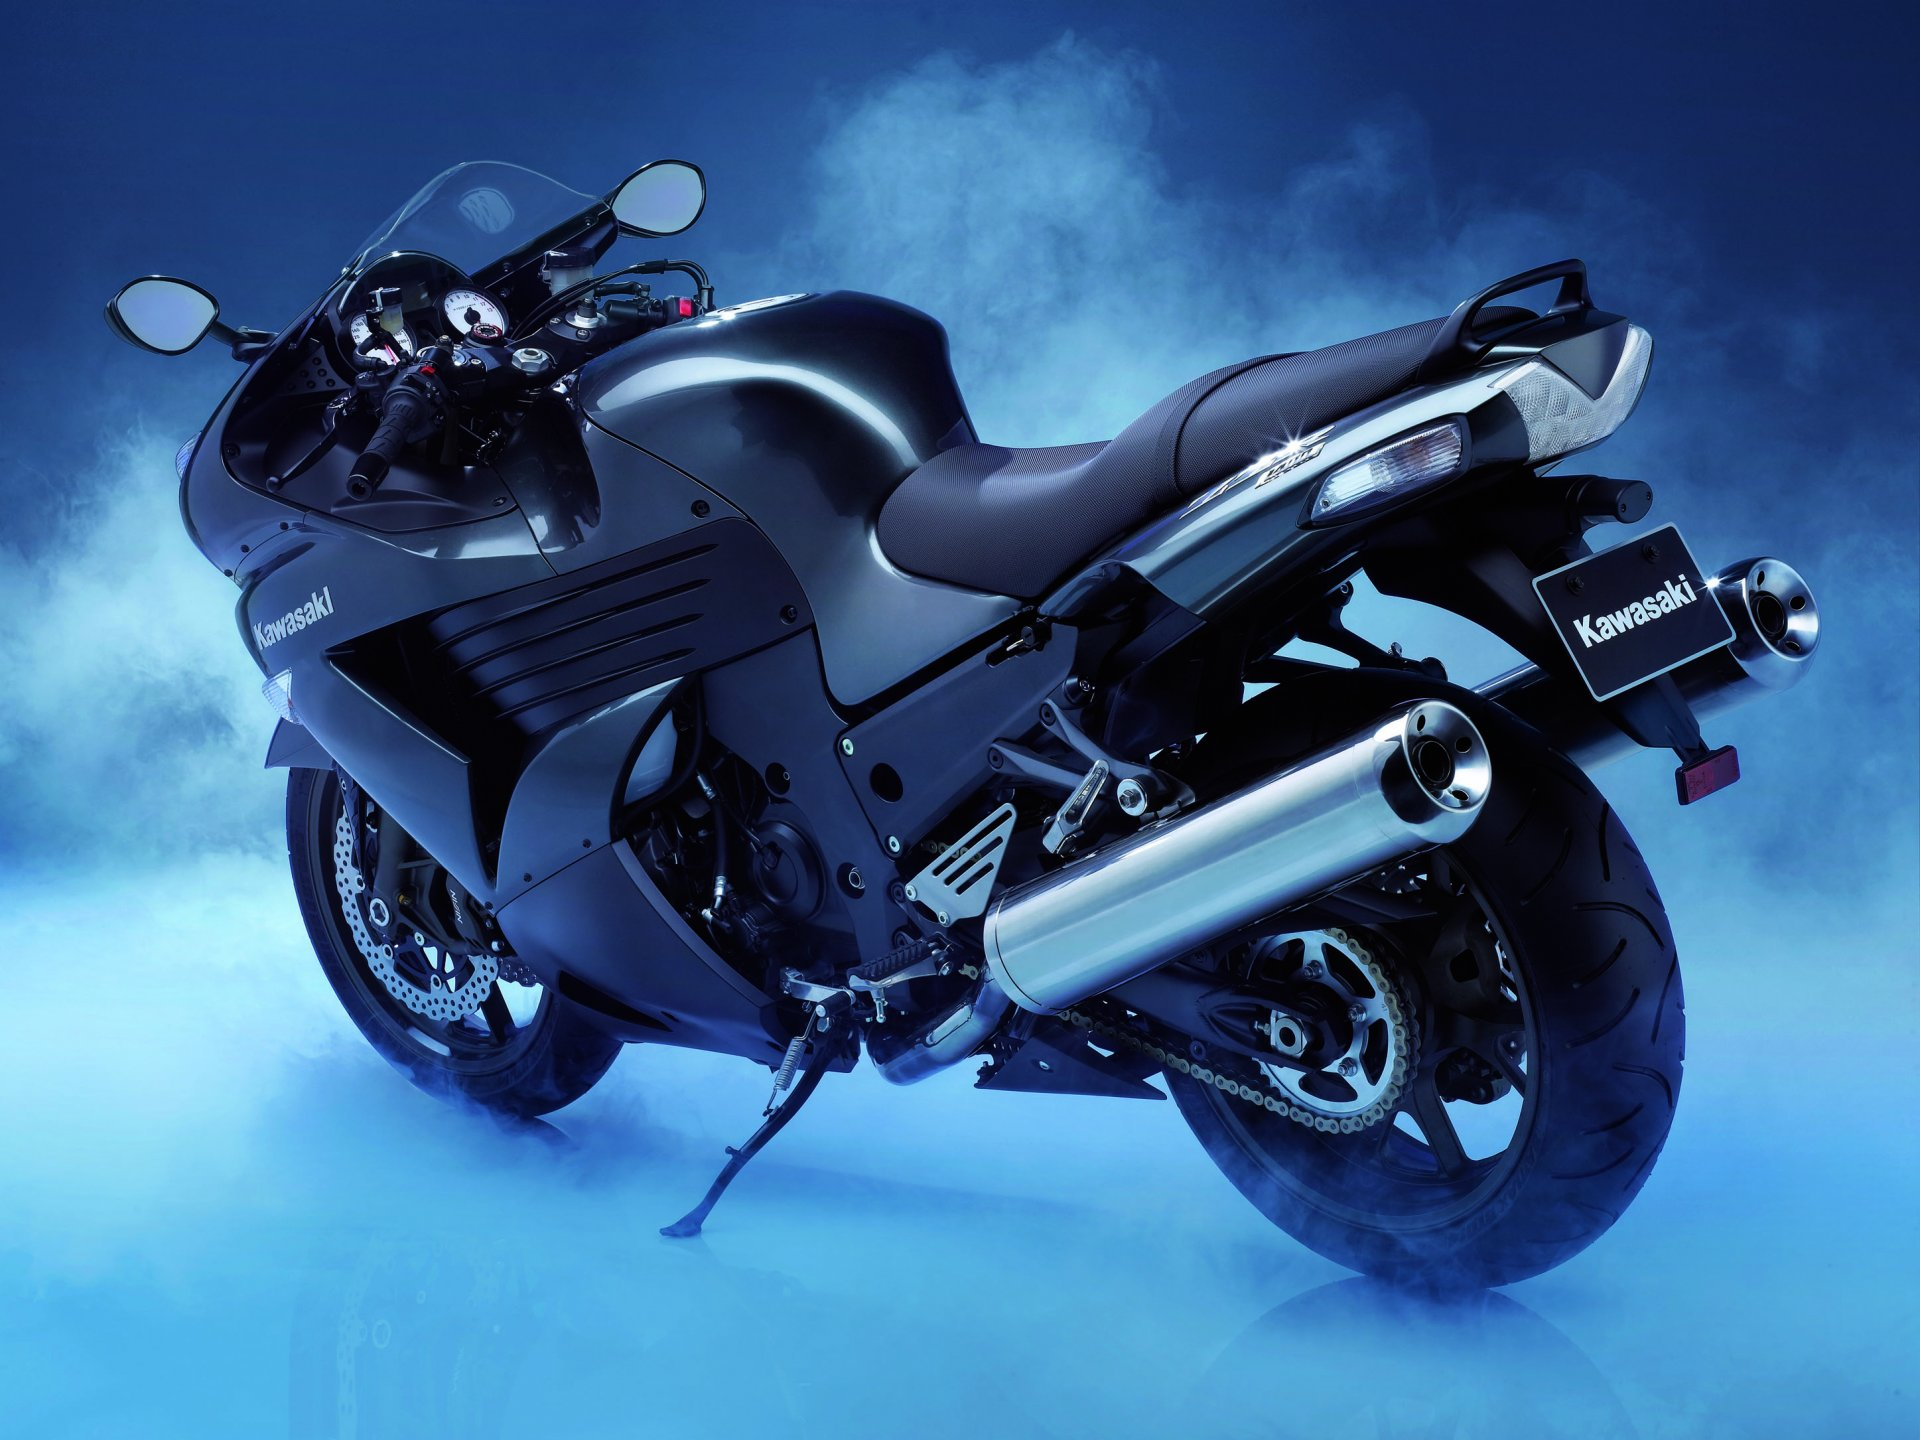 Обои спортивный, z 1000 sx, profile, Kawasaki, Мотоцикл. Мотоциклы foto 9